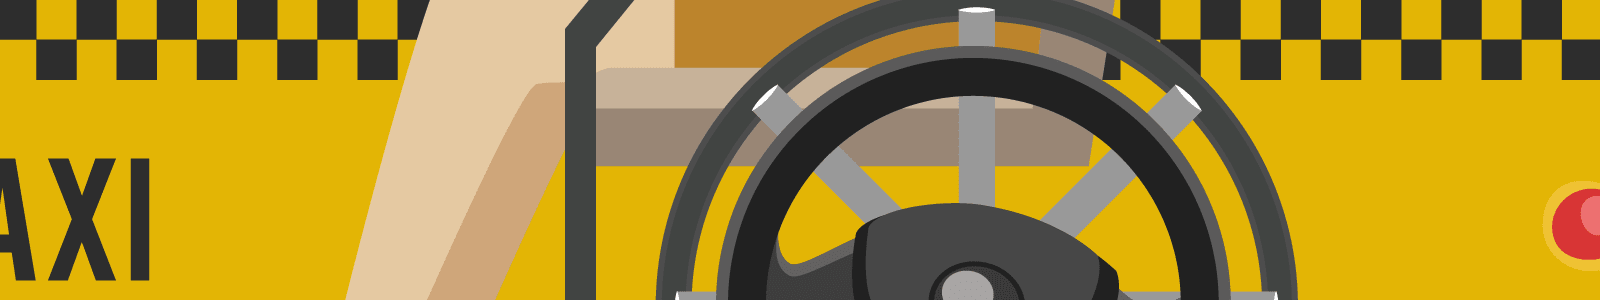 Wheelchair in a taxi